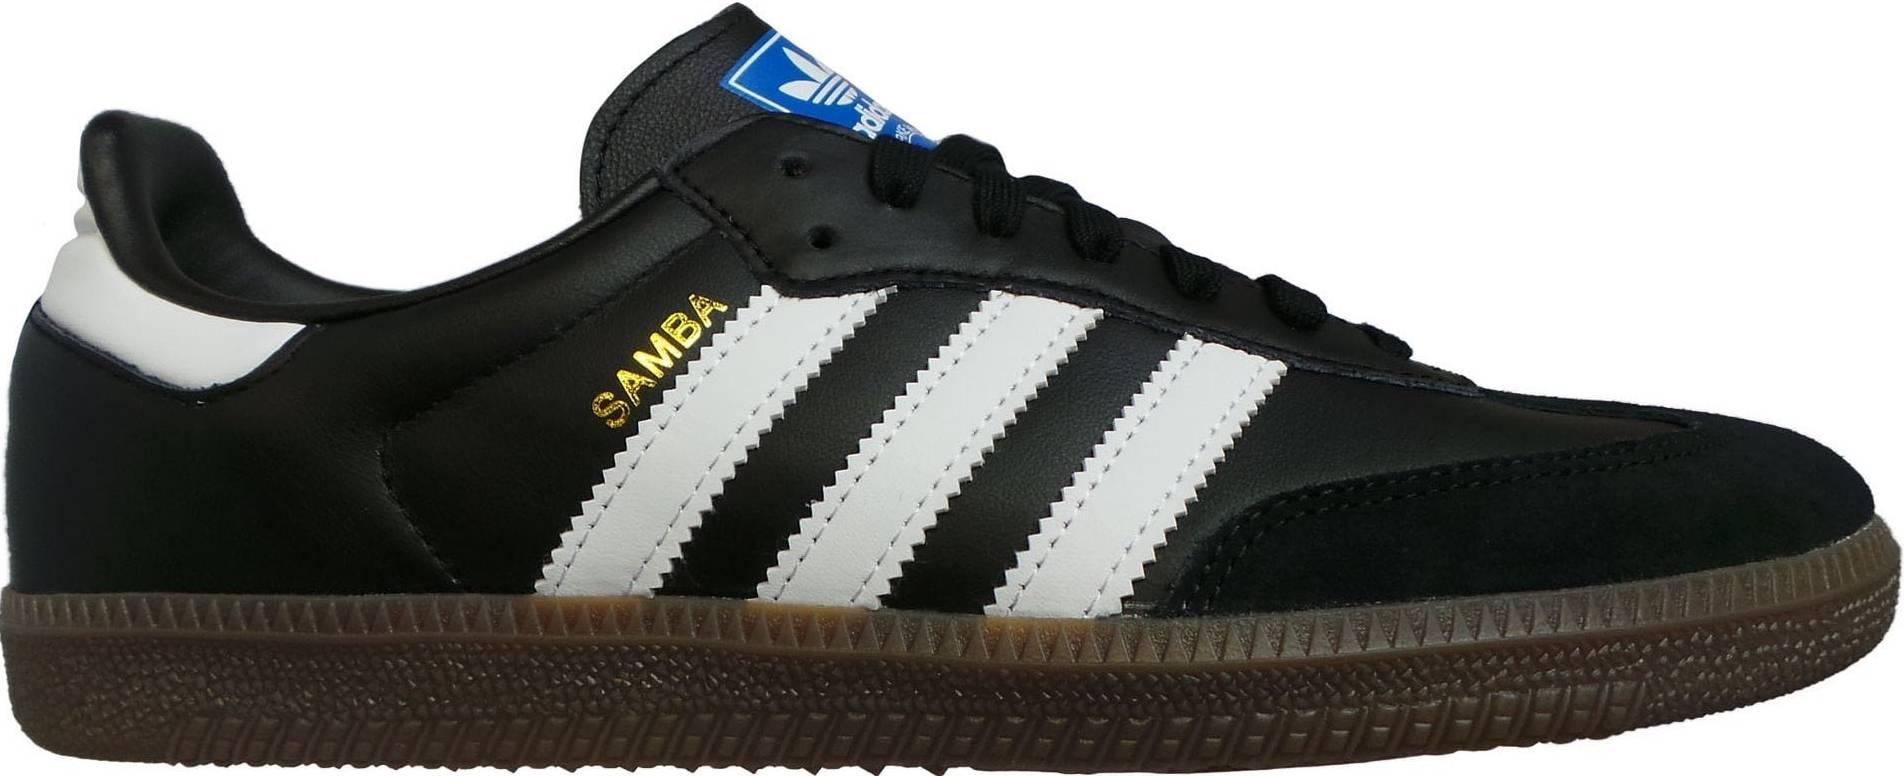 Save 59% on Football Sneakers (45 Models in Stock) | RunRepeat